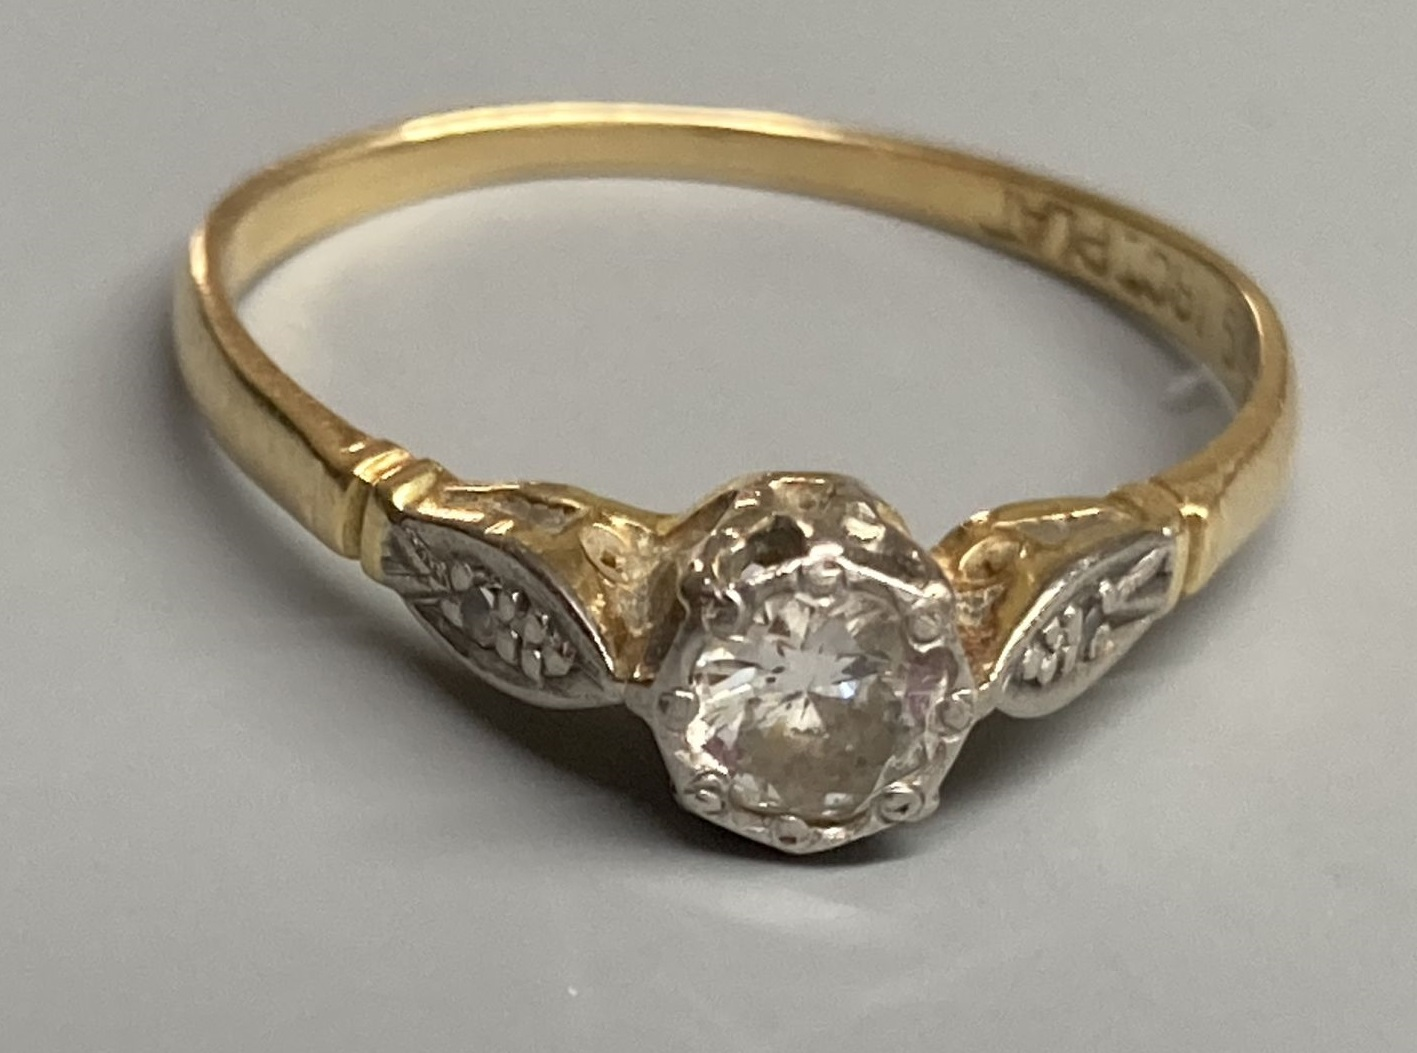 An 18ct & plat, single stone diamond ring, with diamond set shoulders, size P, gross 1.9 grams.